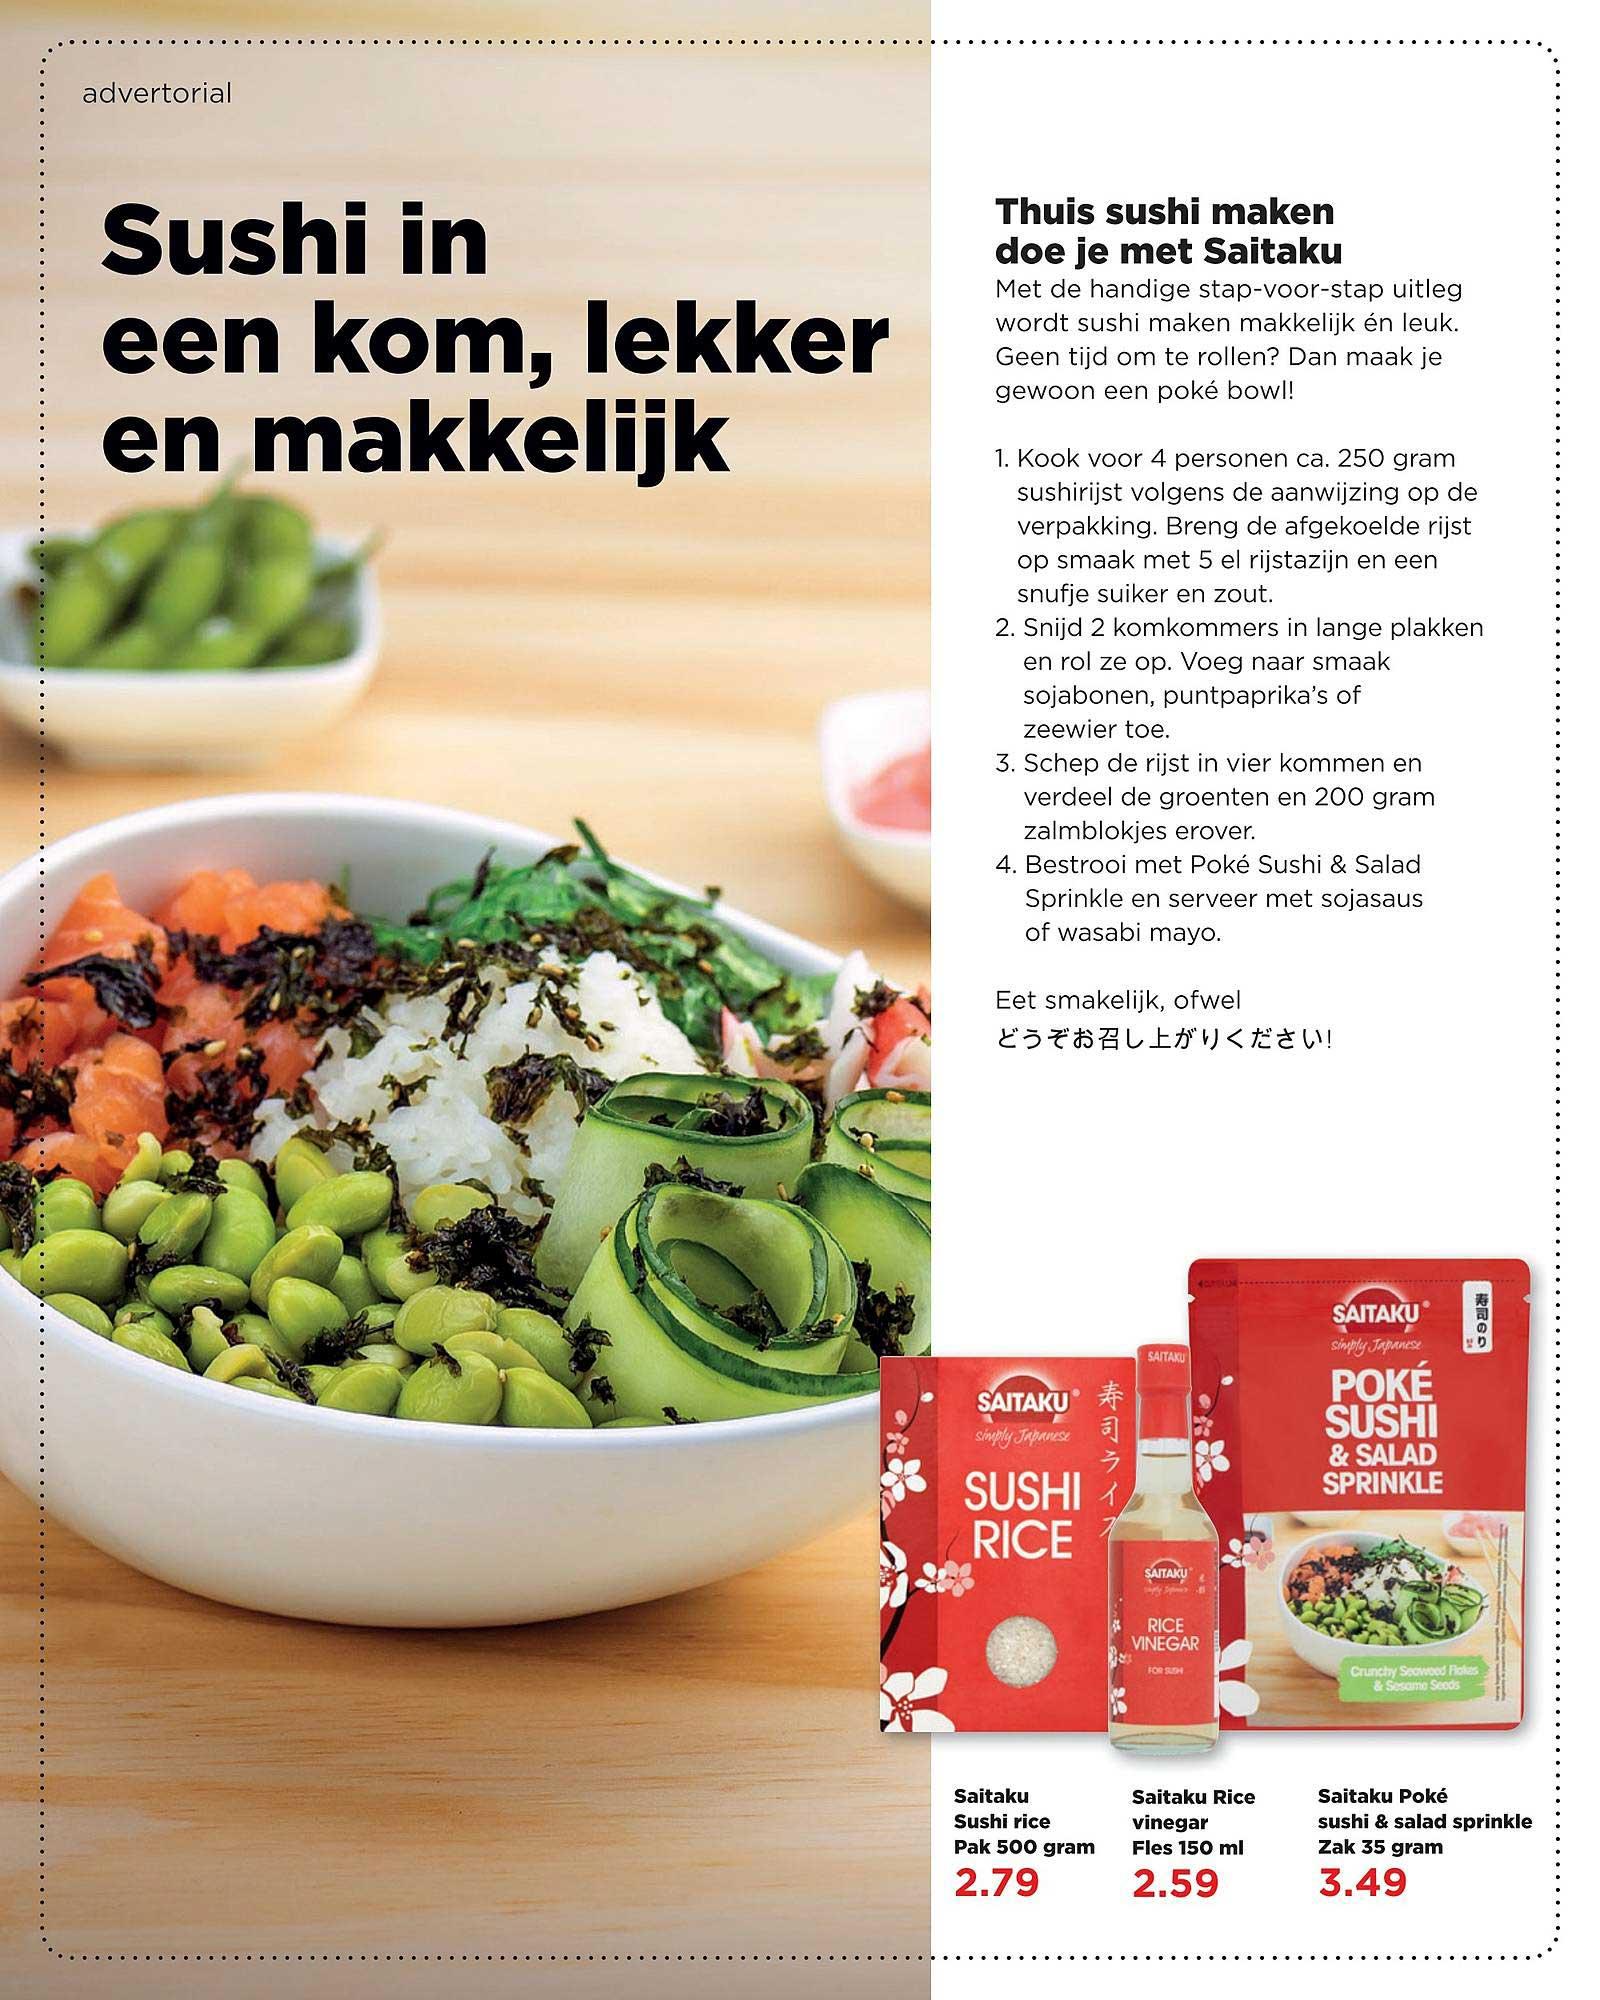 PLUS Saitaku Sushi Rice, Saitaku Rice Vinegar Of Saitaku Poké Sushi & Salad Sprinkle